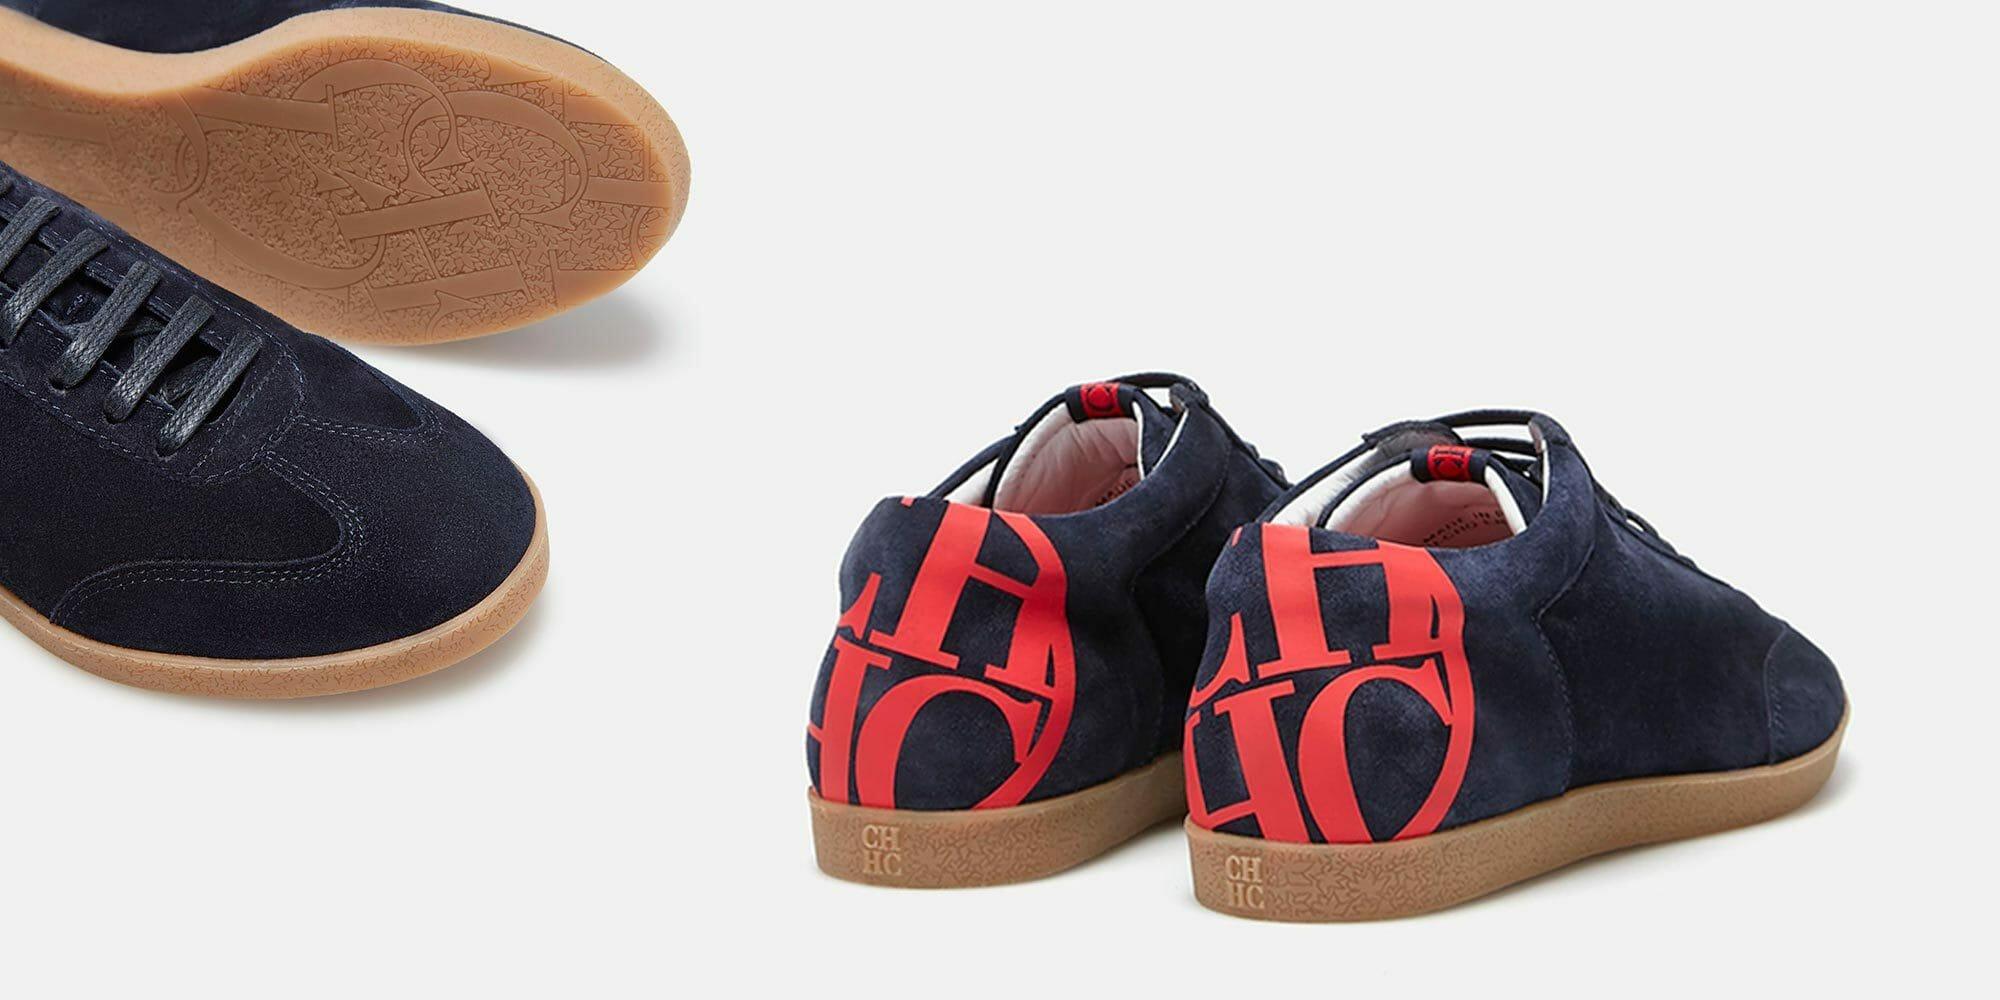 ch-carolina-herrera-sneakers-image